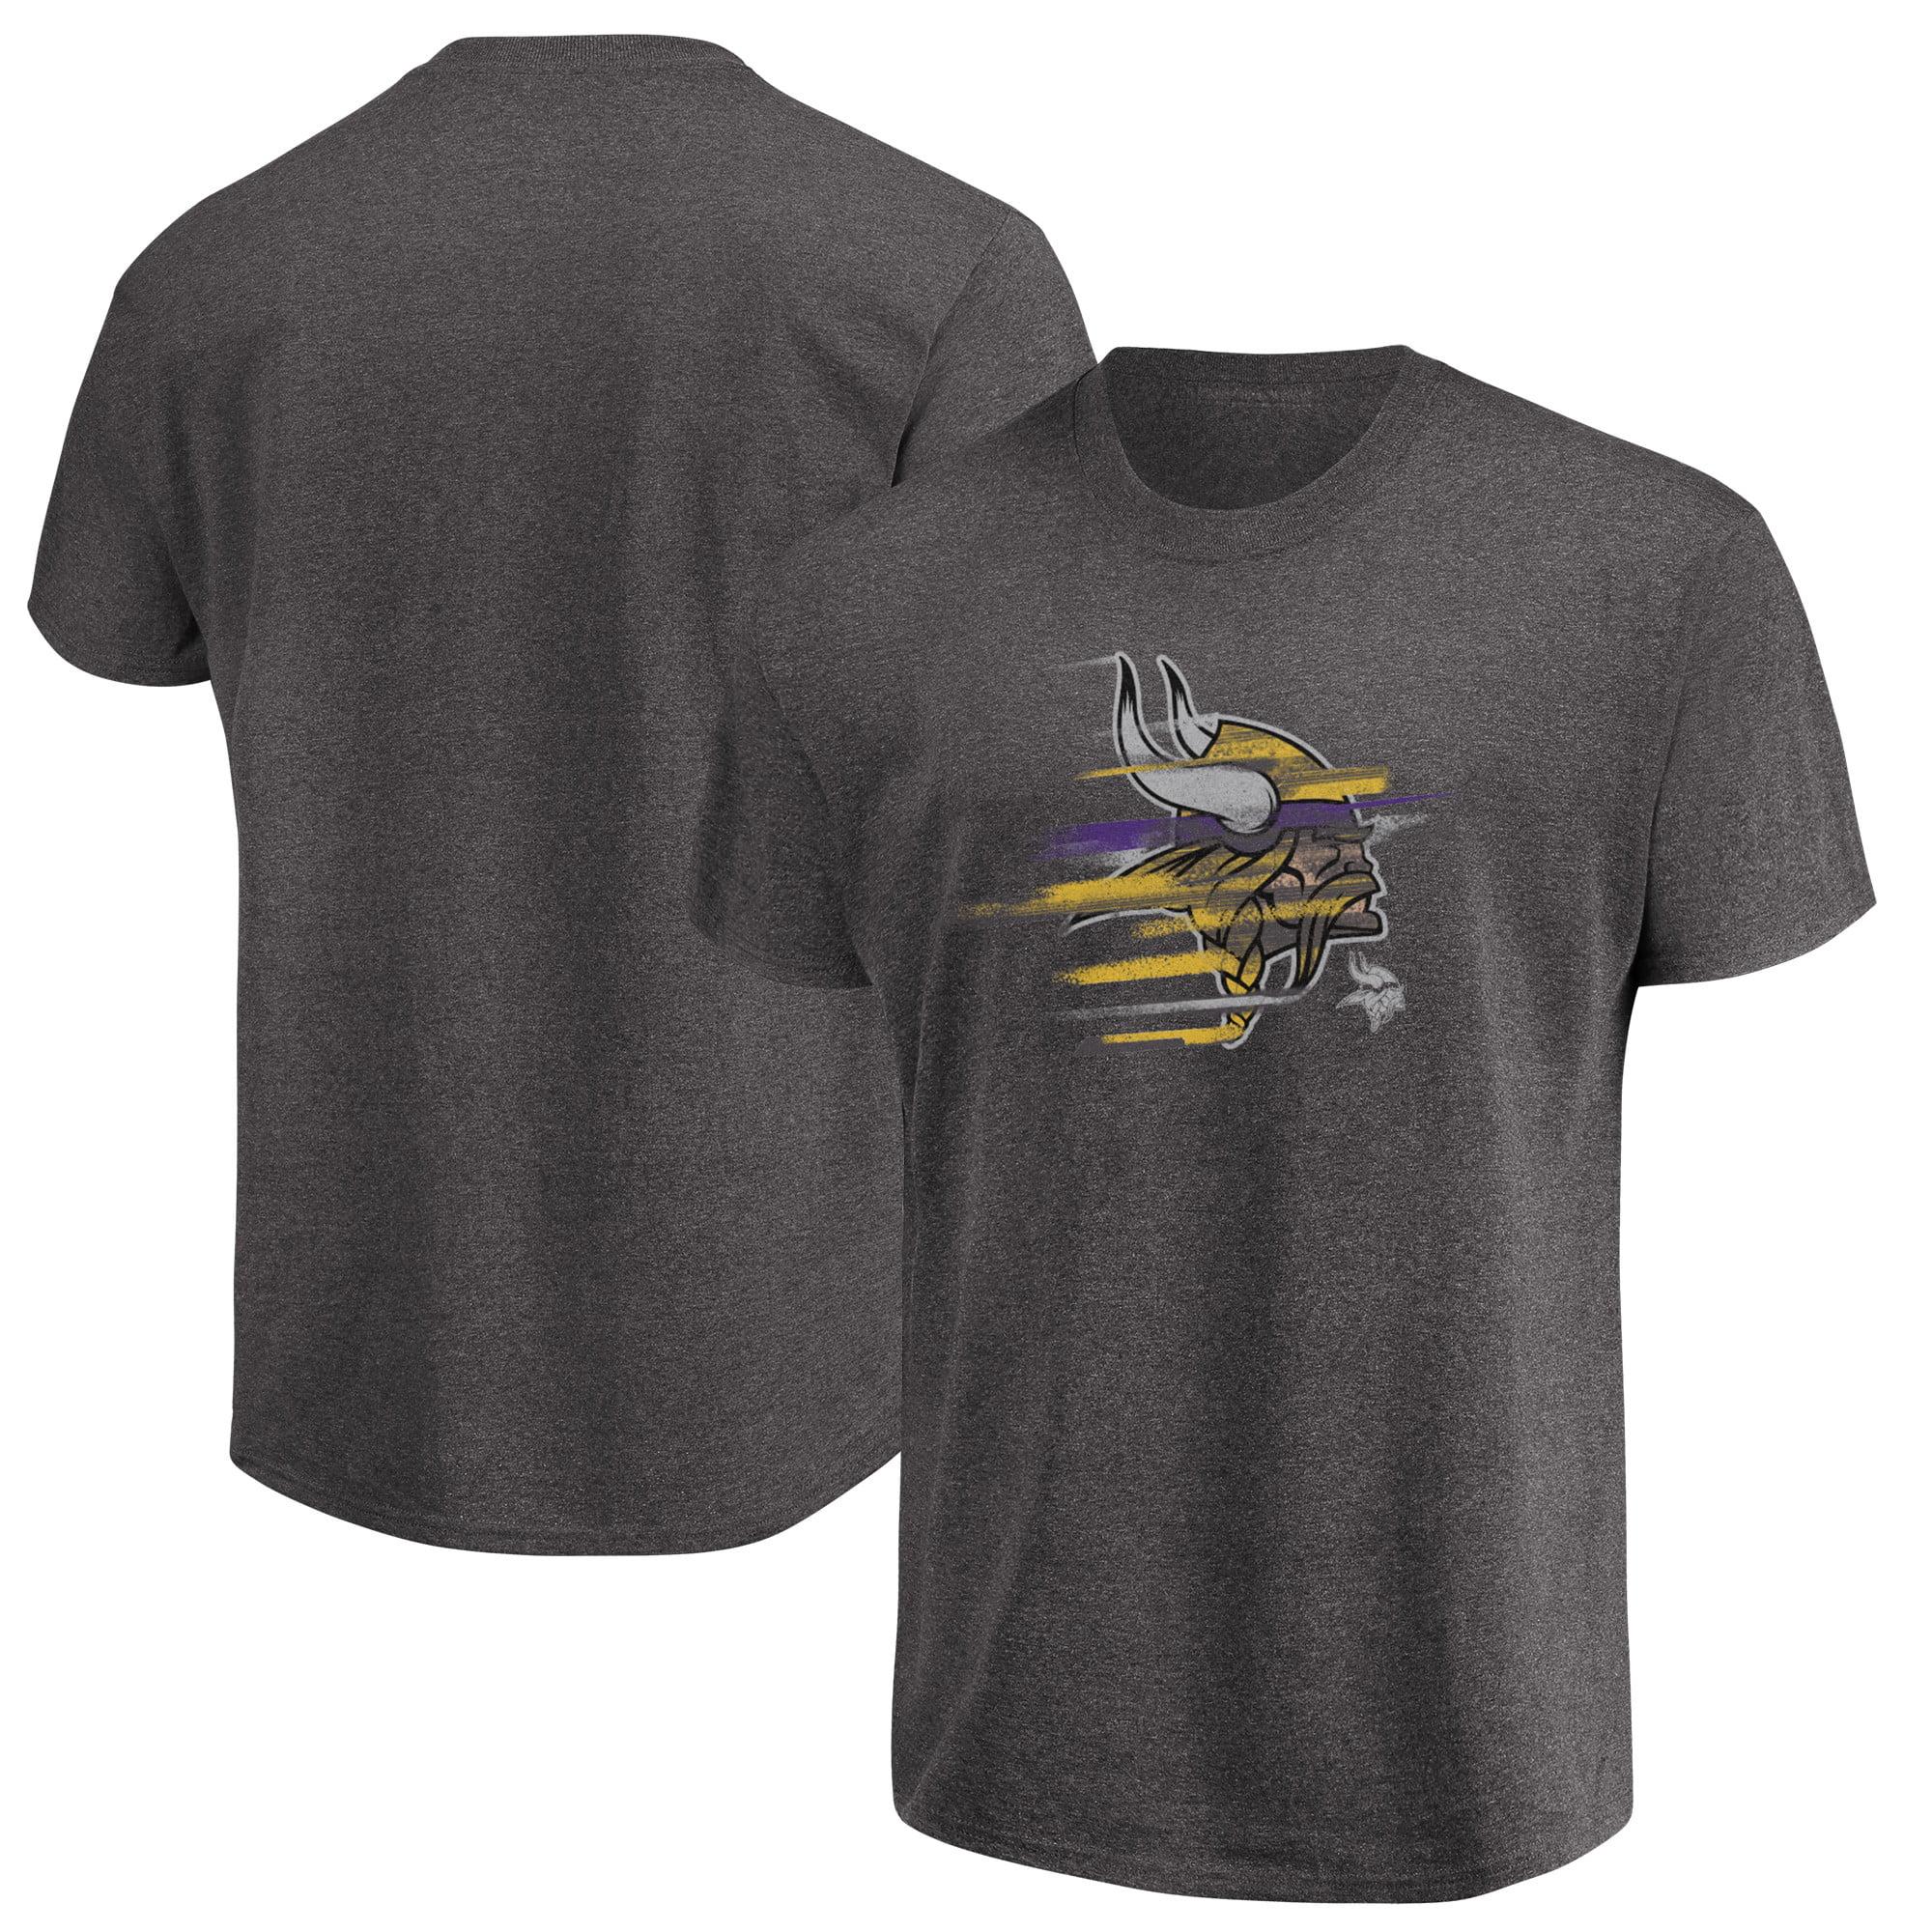 Minnesota Vikings Majestic Big & Tall Fierce Intensity T-Shirt - Heathered Charcoal